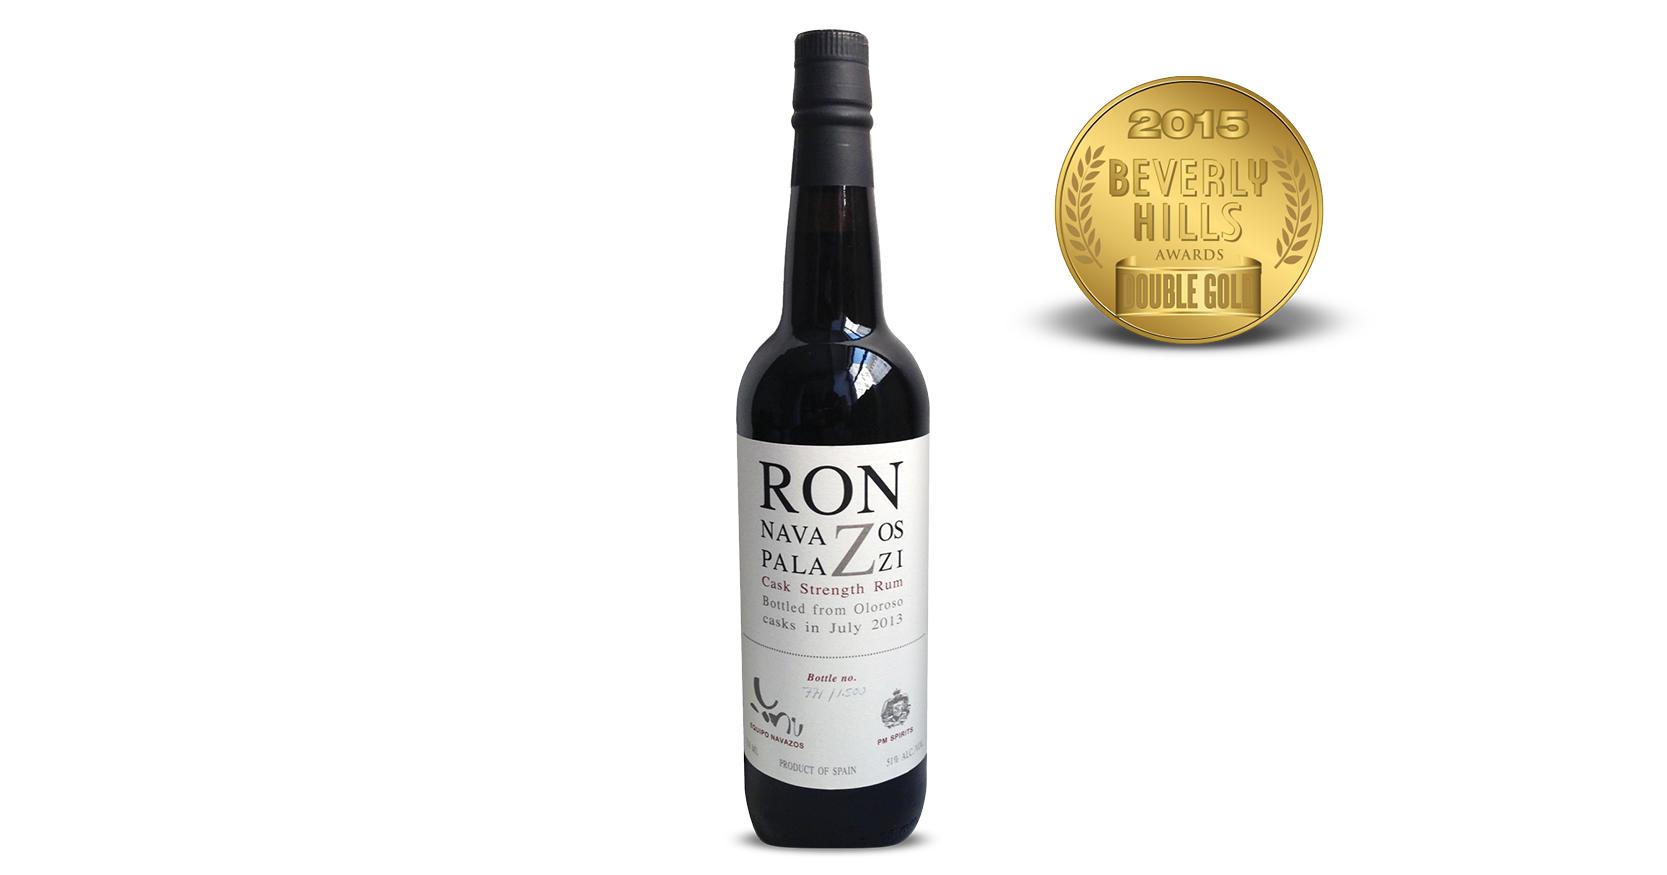 Navazos-Palazzi Ron Cask Strength Rum